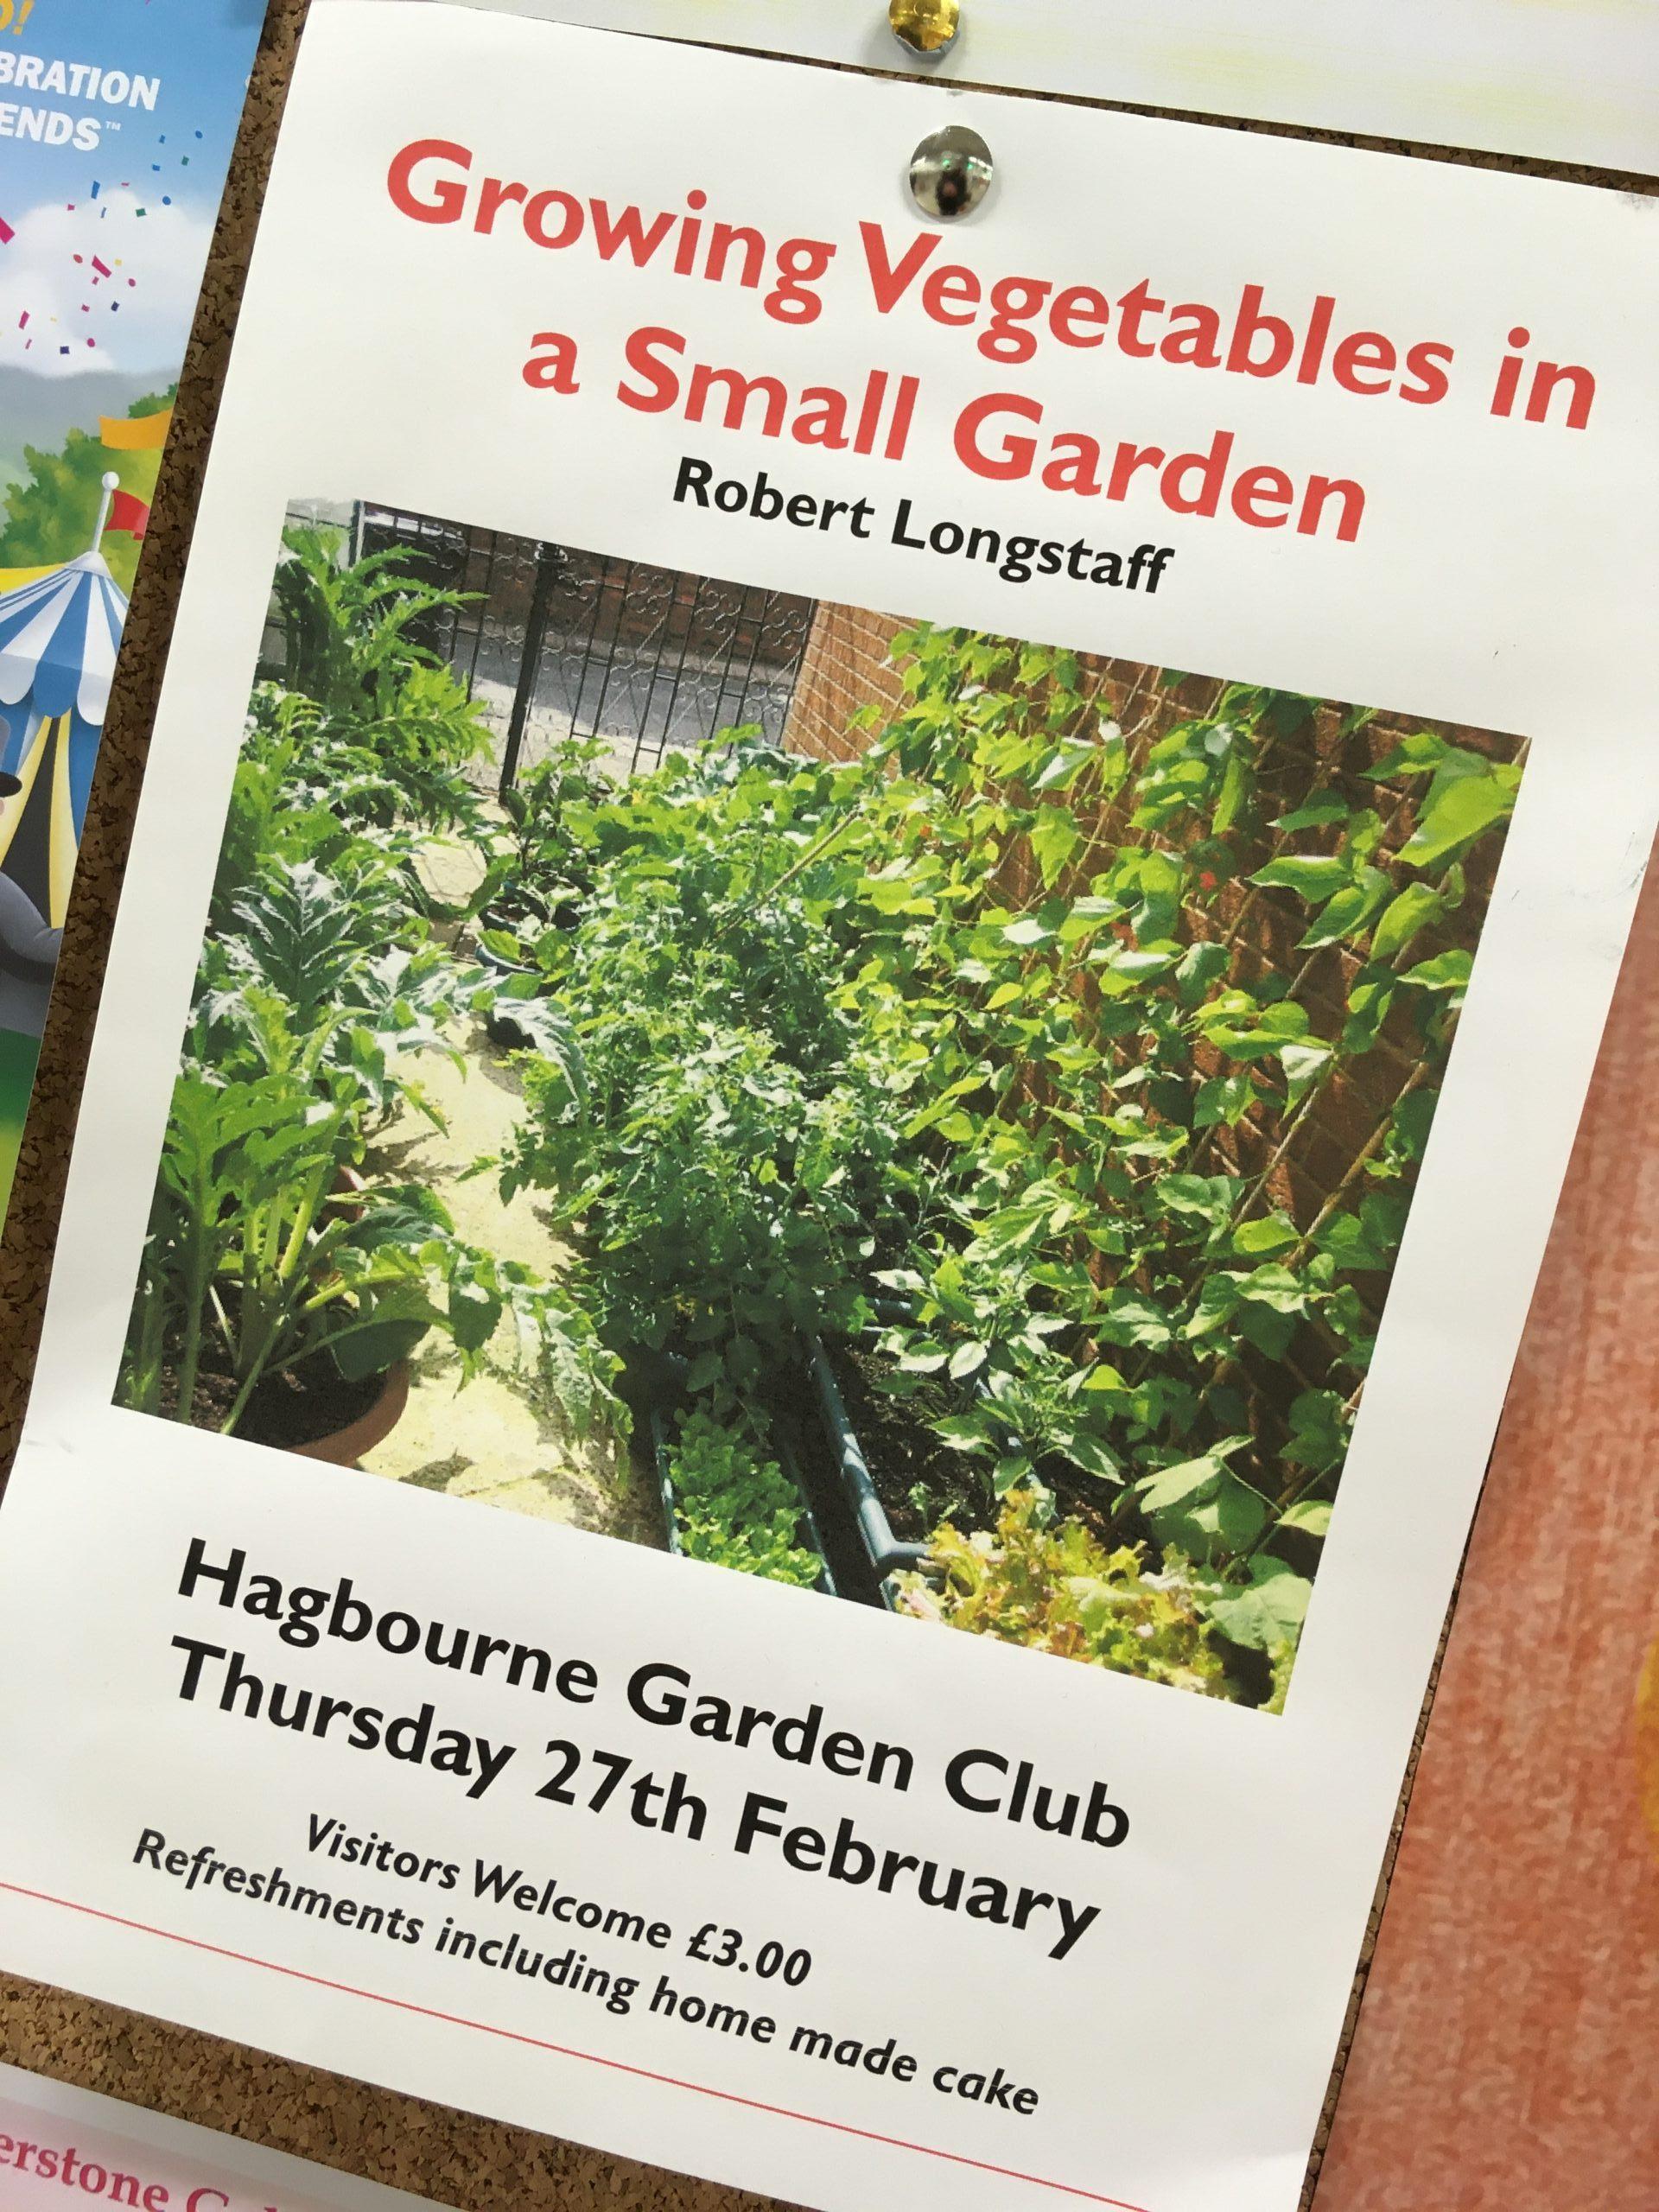 Hagbourne Garden Club - Growing Vegetables in a Small Garden